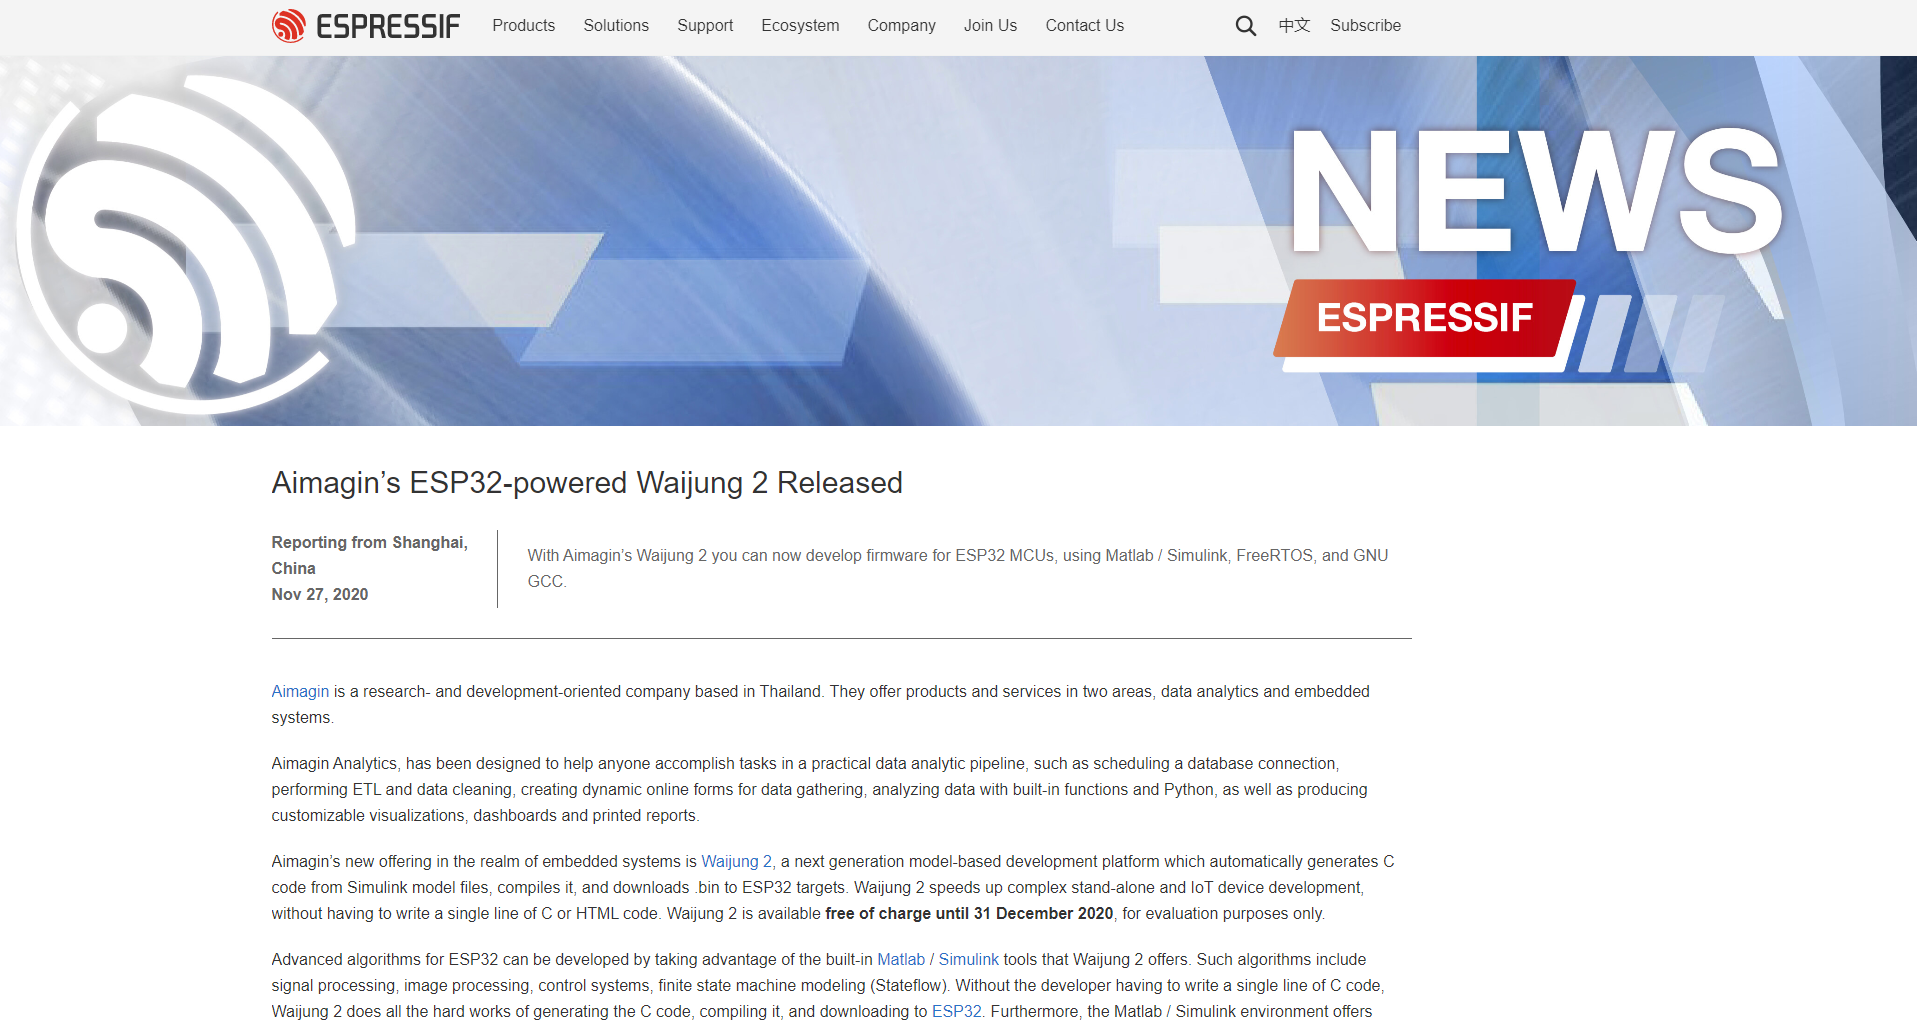 Espressif Aimagin's ESP32-powered Waijung 2 News Released